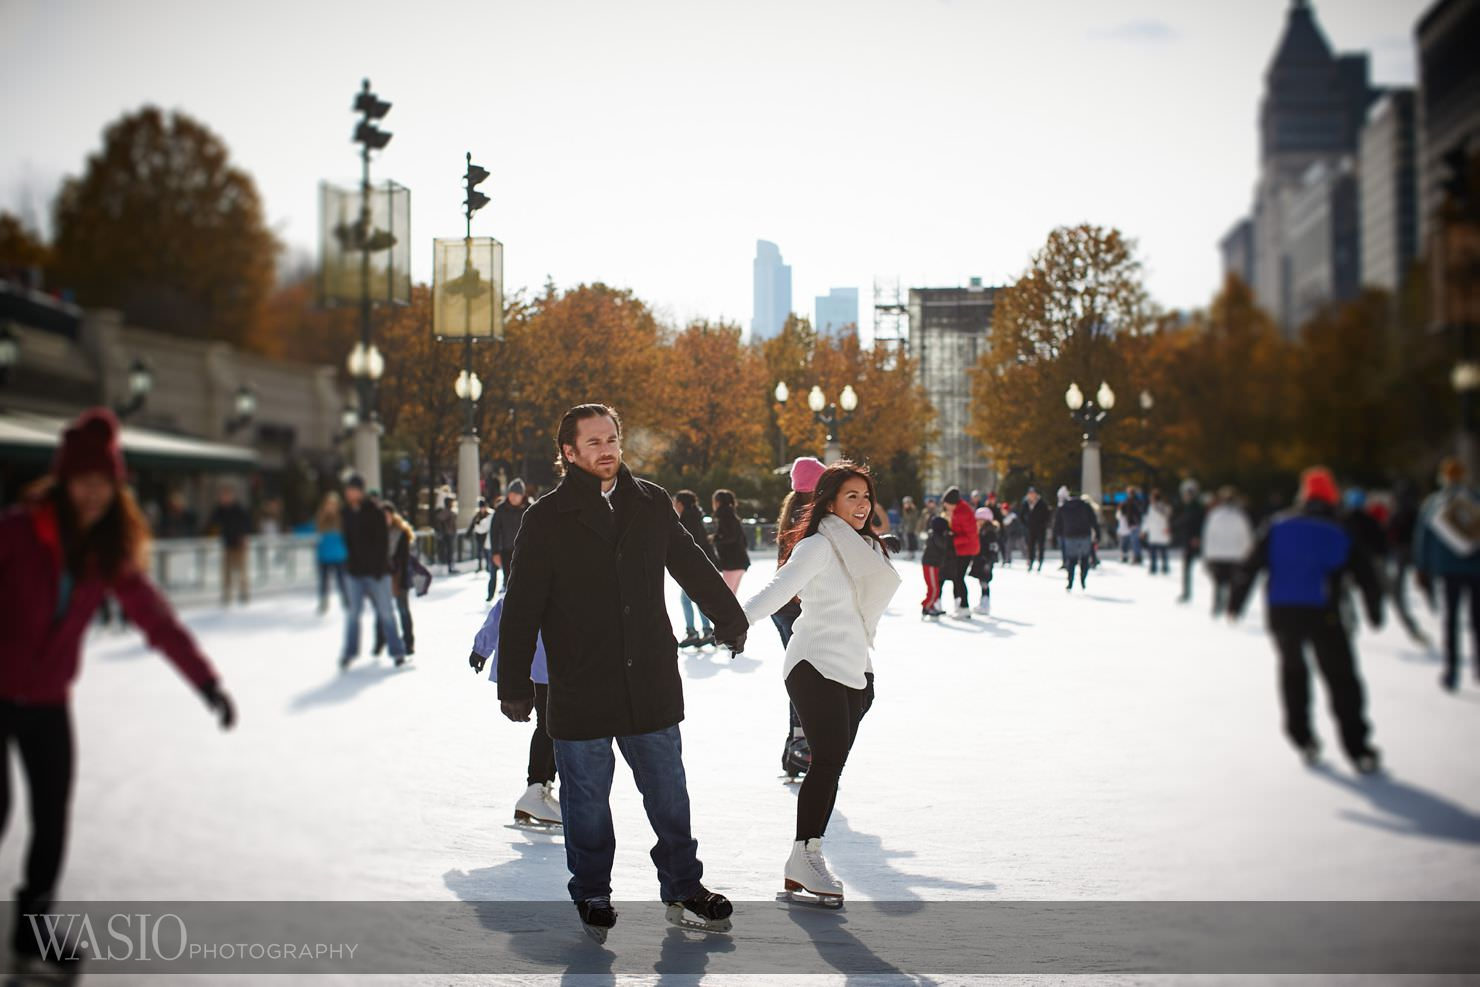 2_Chicago-Winter-Engagement-winter-chicago-skating__O3A9645 Chicago Winter Engagement Photos - Ingrid and Peter